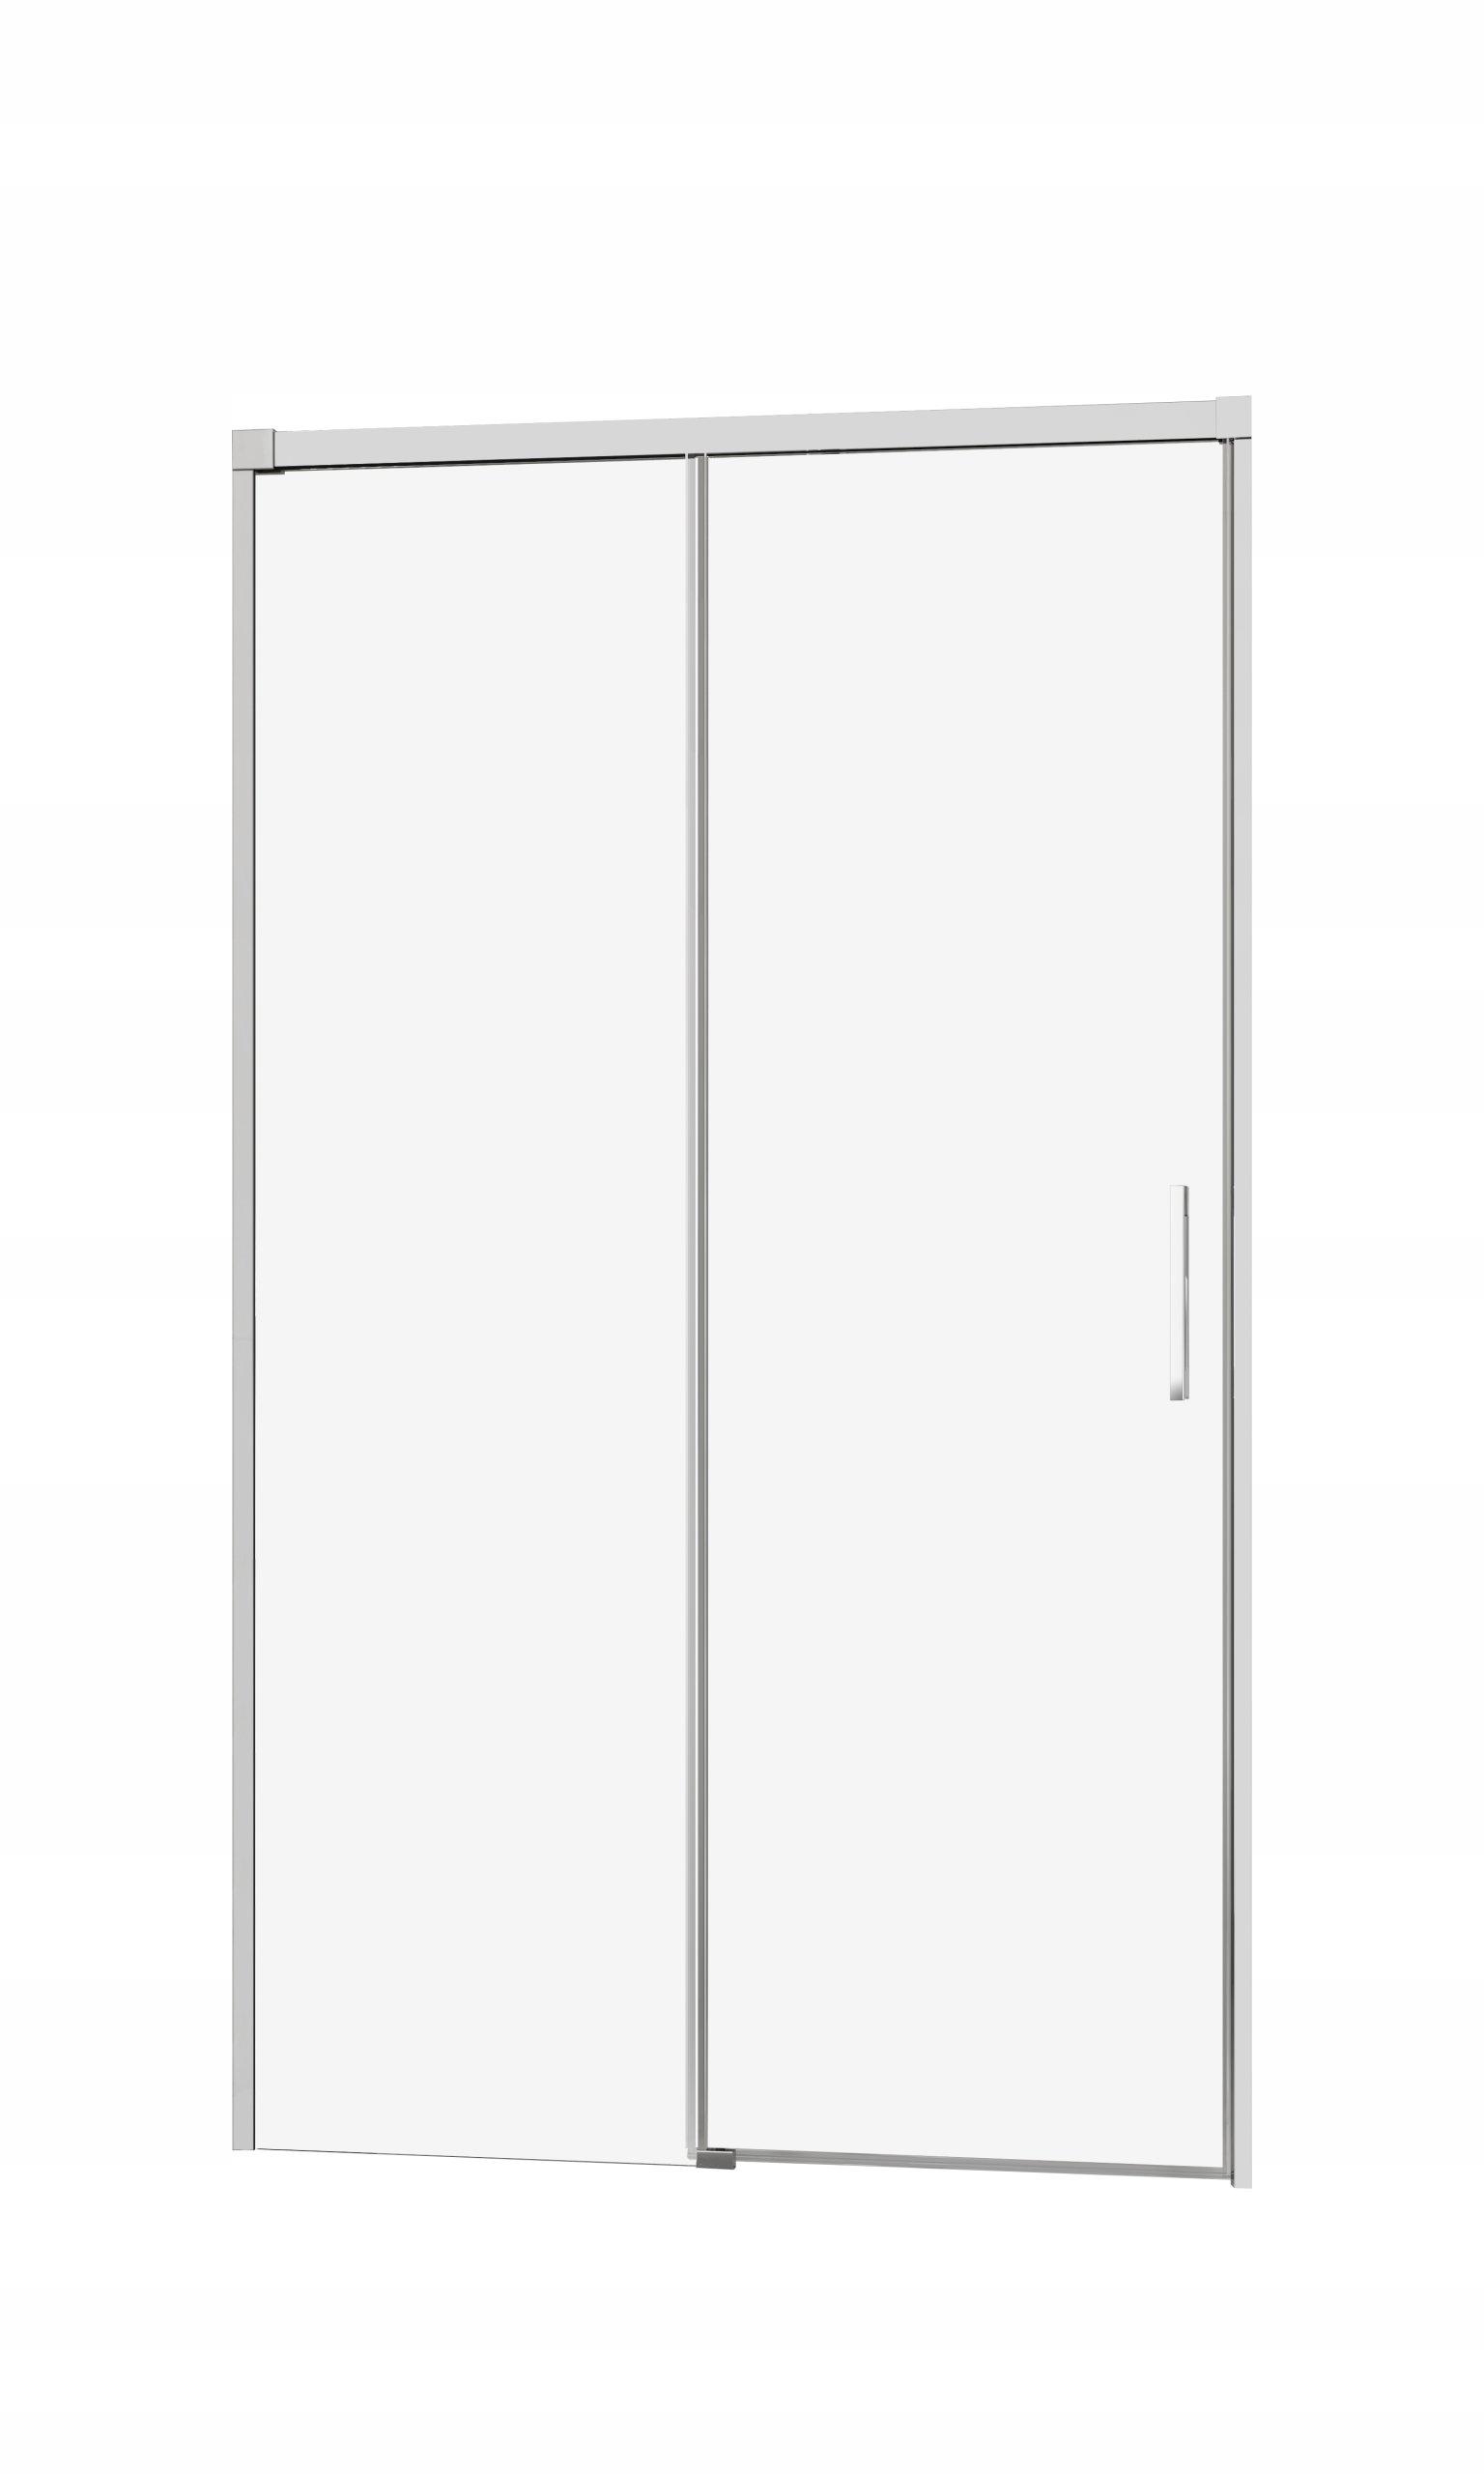 Sprchové dvere kupé Nápad DWJ RADAWAY 120x200